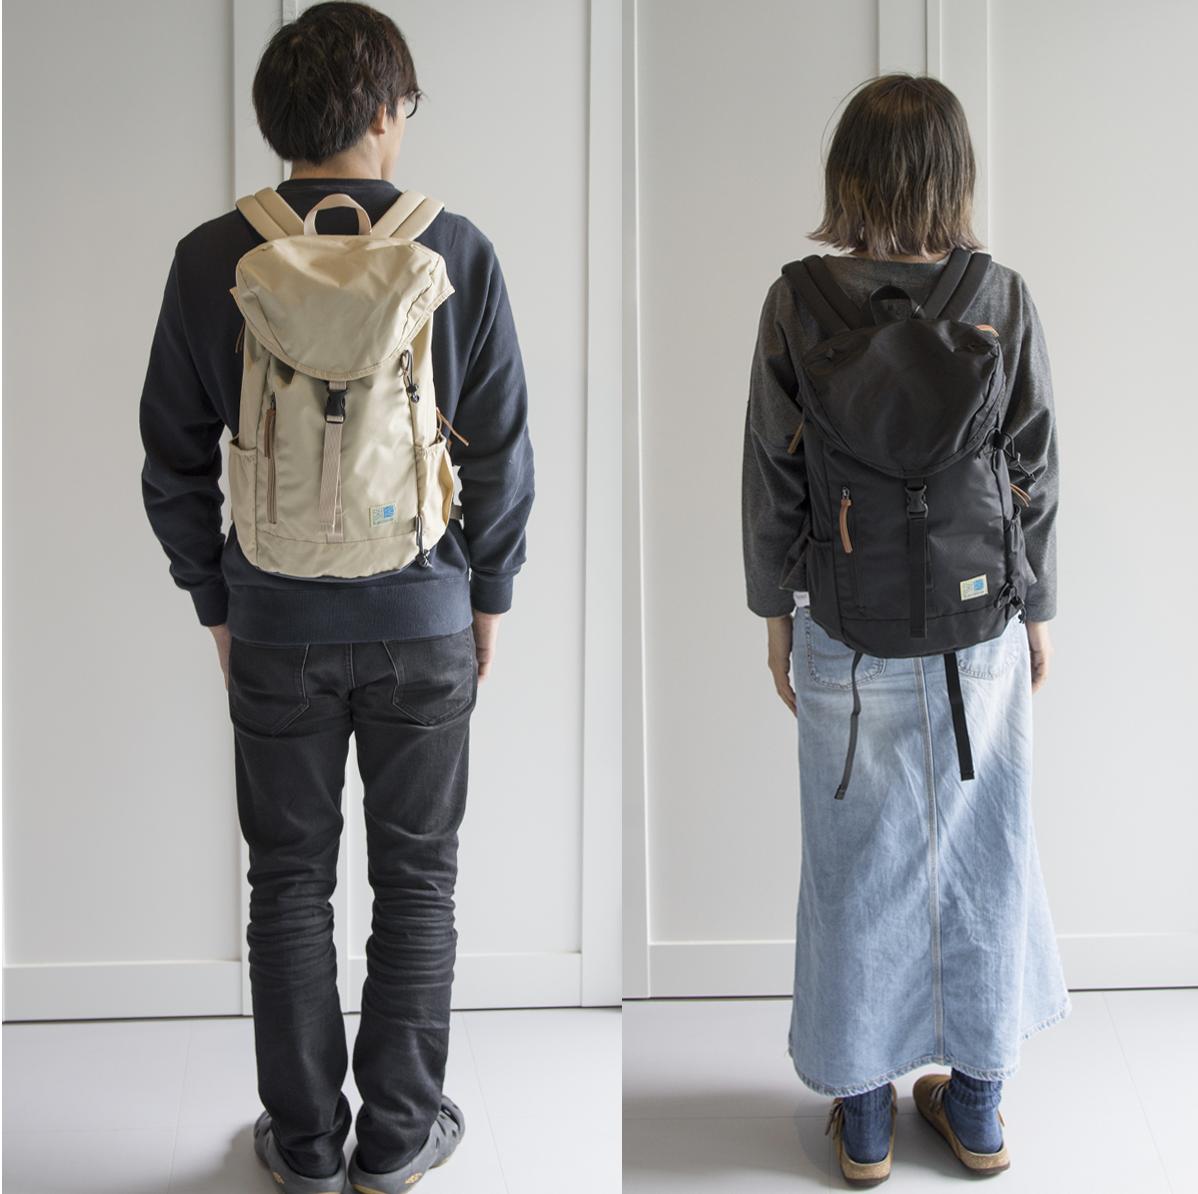 f:id:thebackpack:20190829190211p:plain